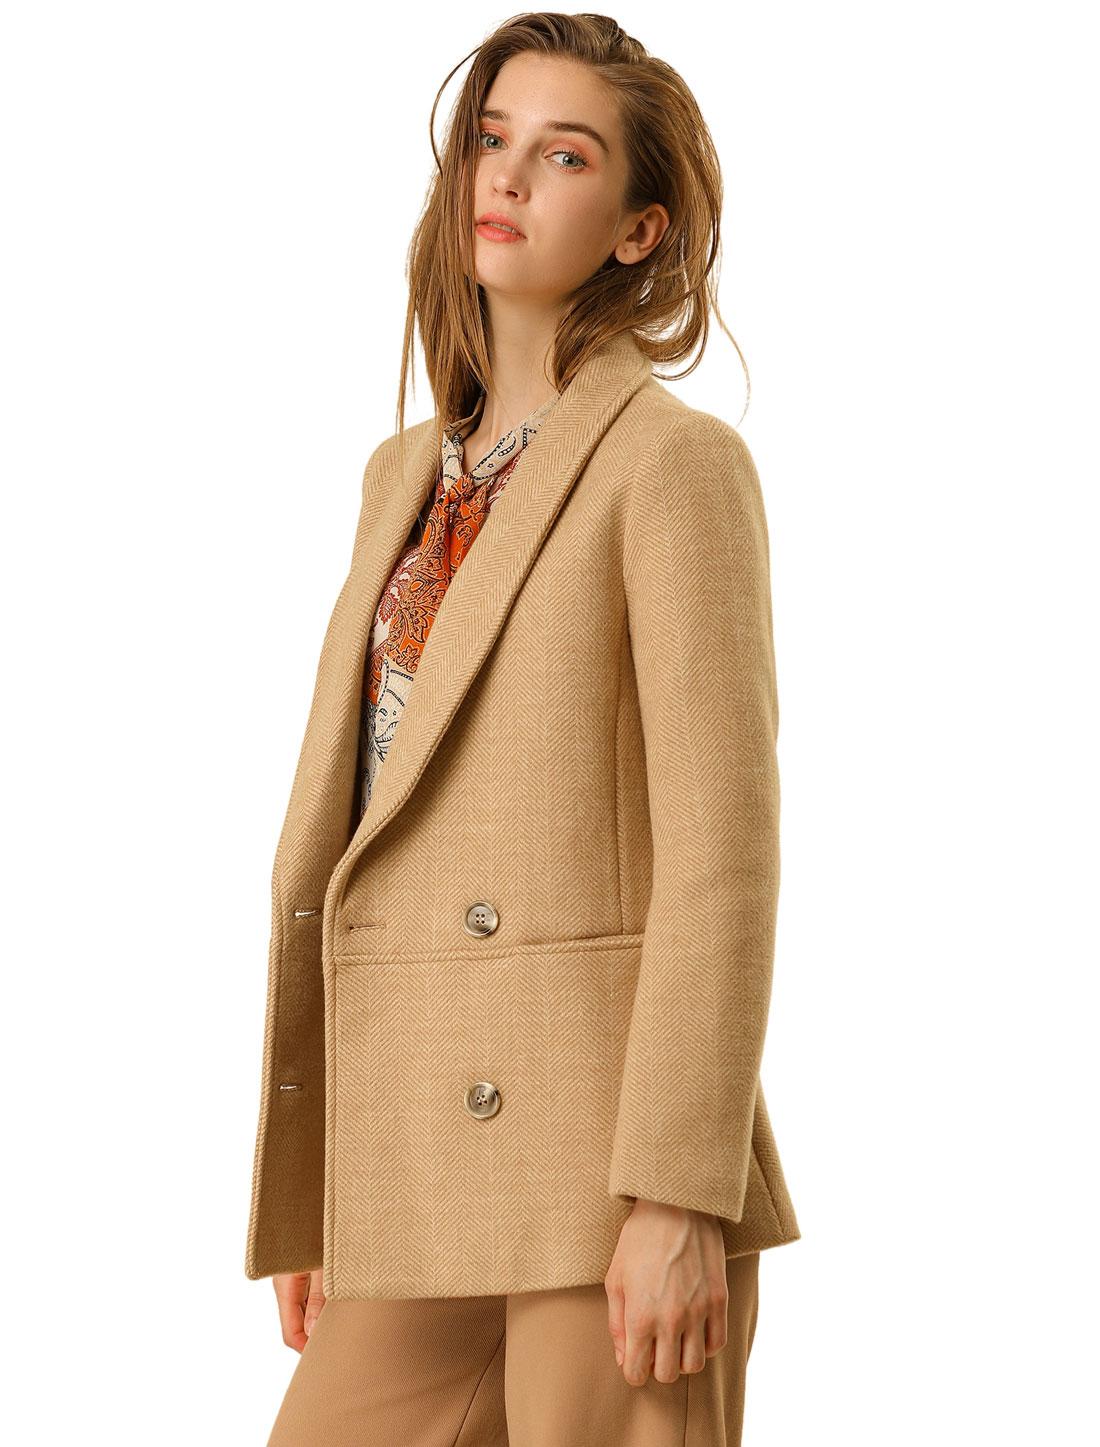 Women's Double Breasted Chevron Pattern Short Pea Coat Tan S